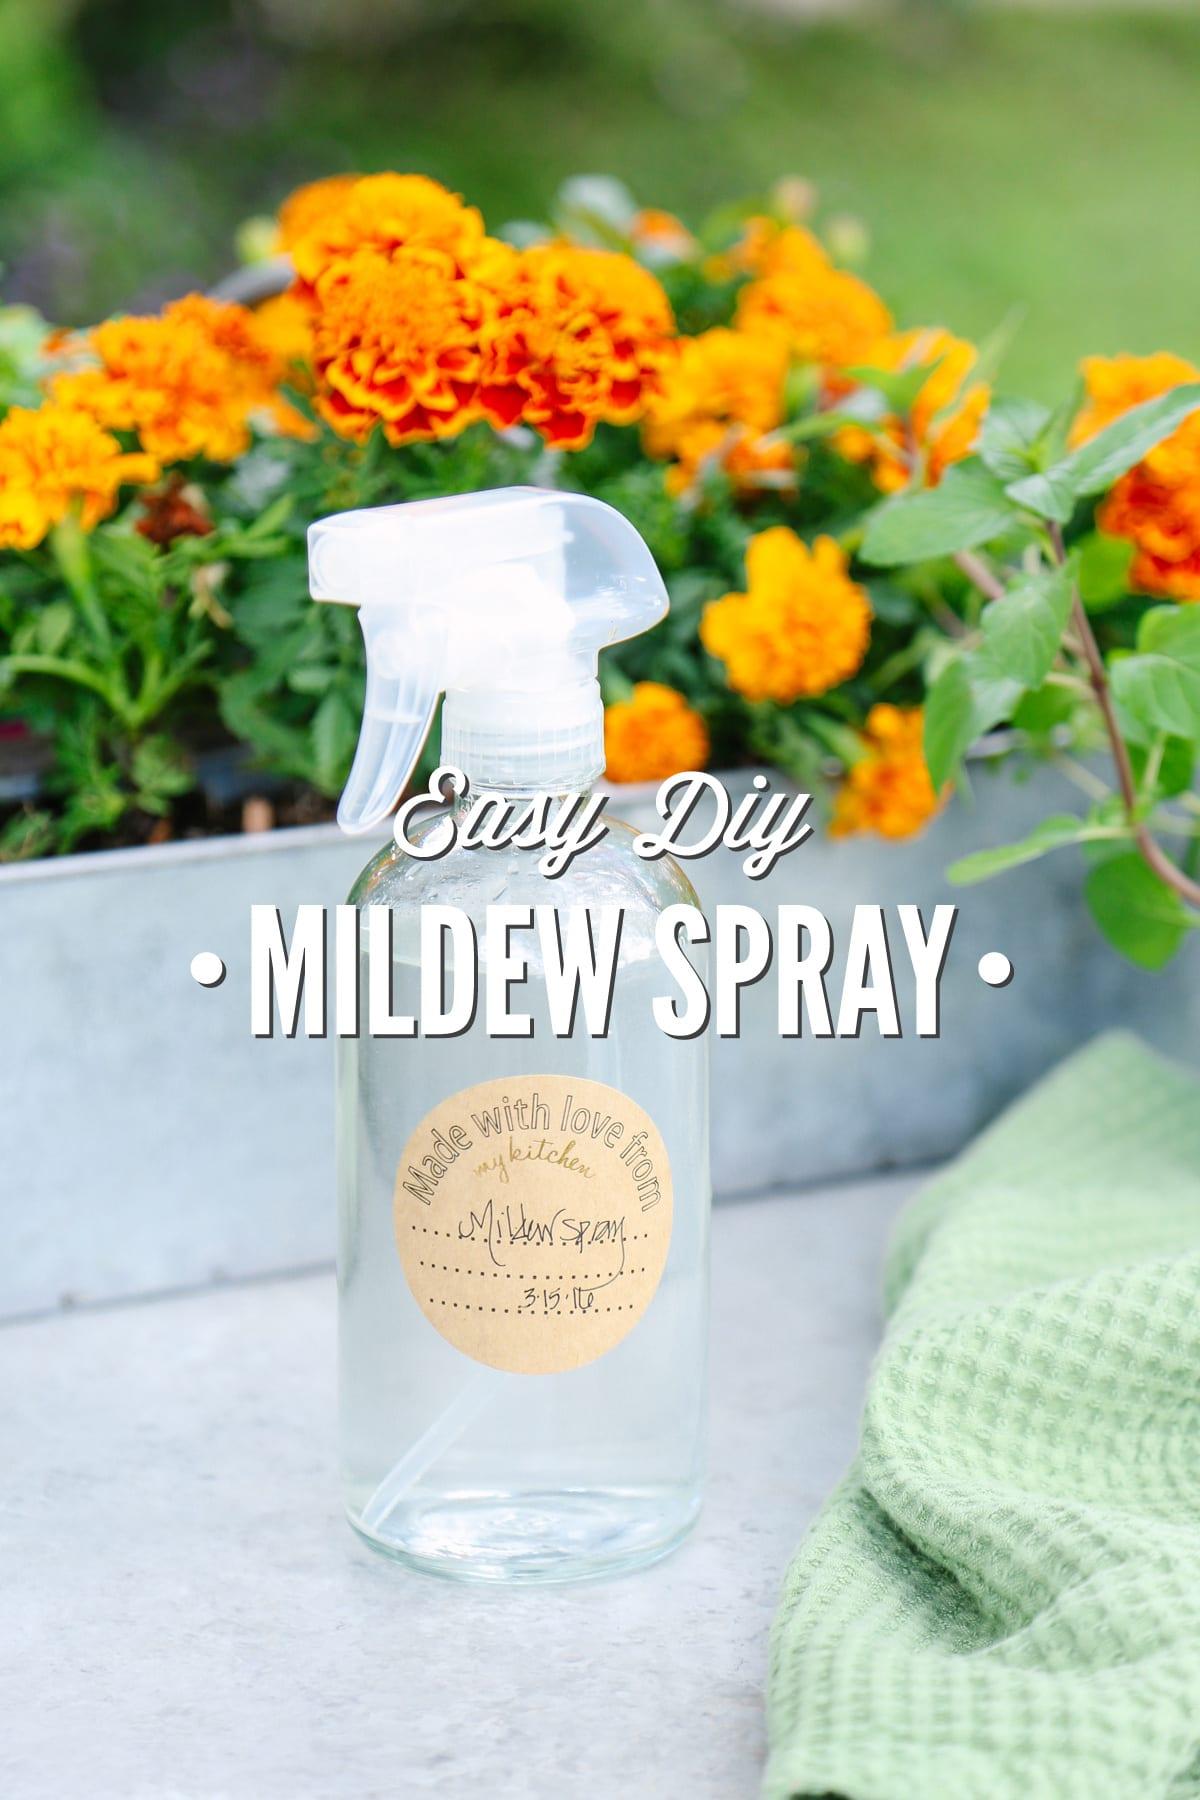 How to Use Homemade Garden Sprays Safely How to Use Homemade Garden Sprays Safely new pictures